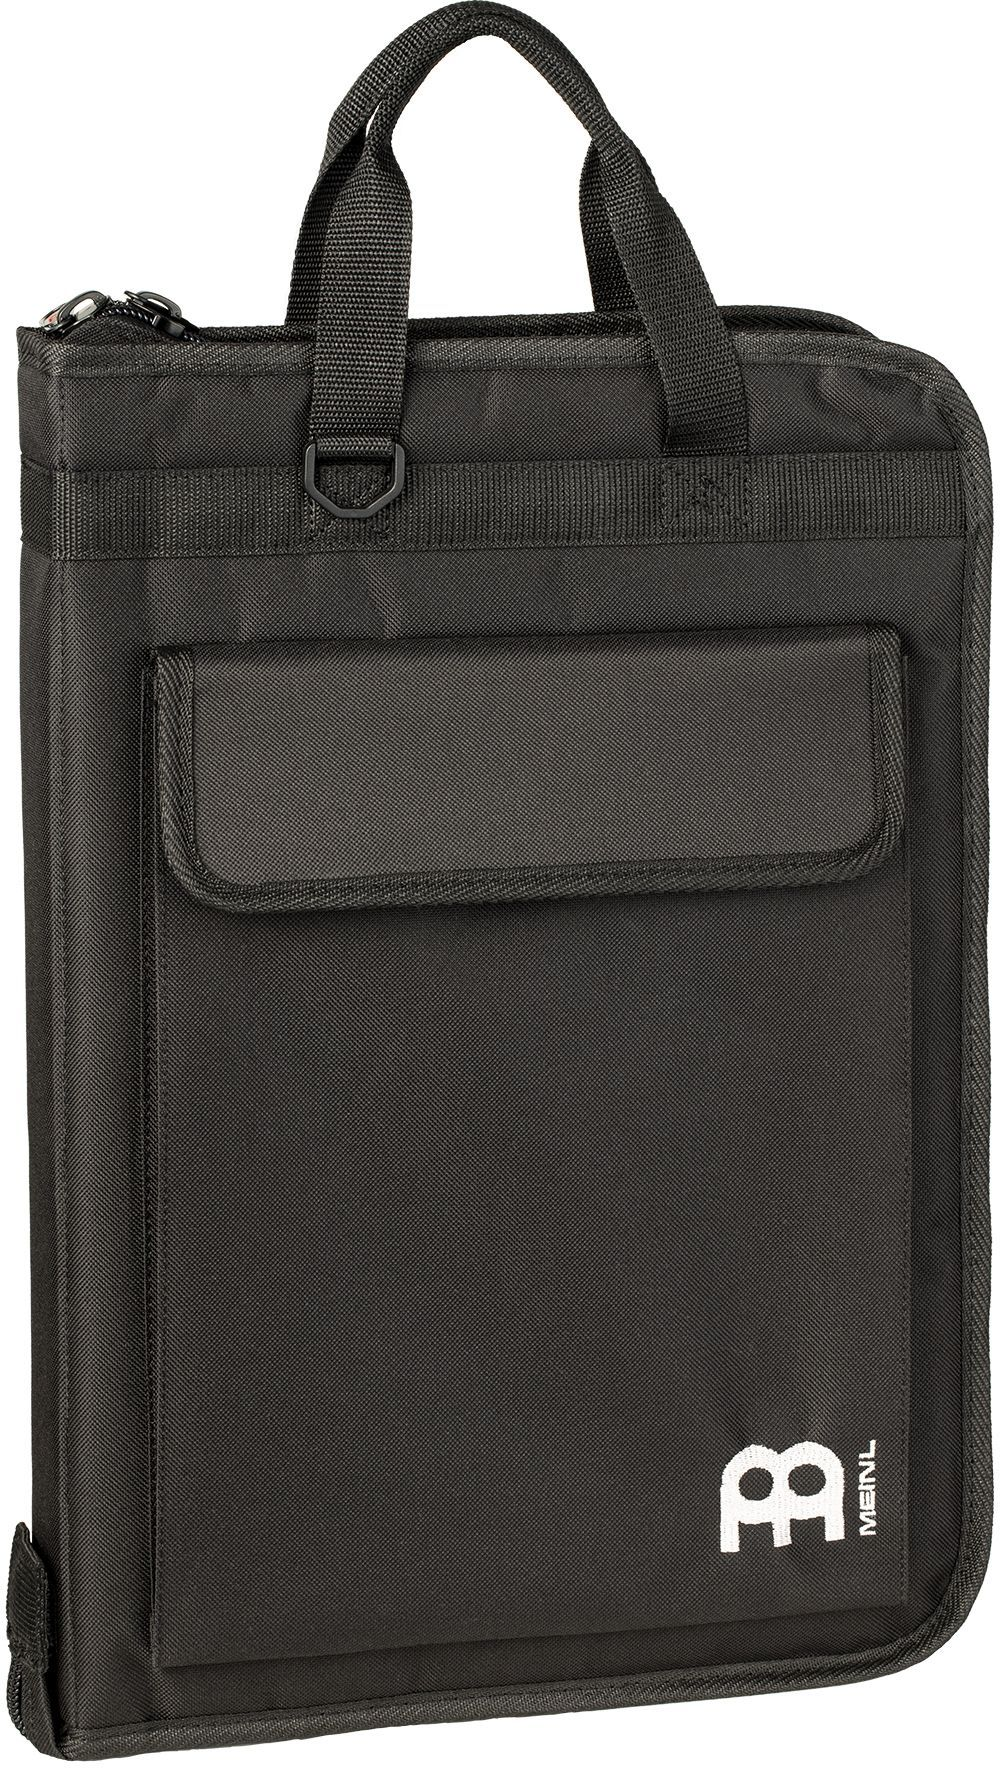 Meinl MSSB Professional Stick Sling Bag